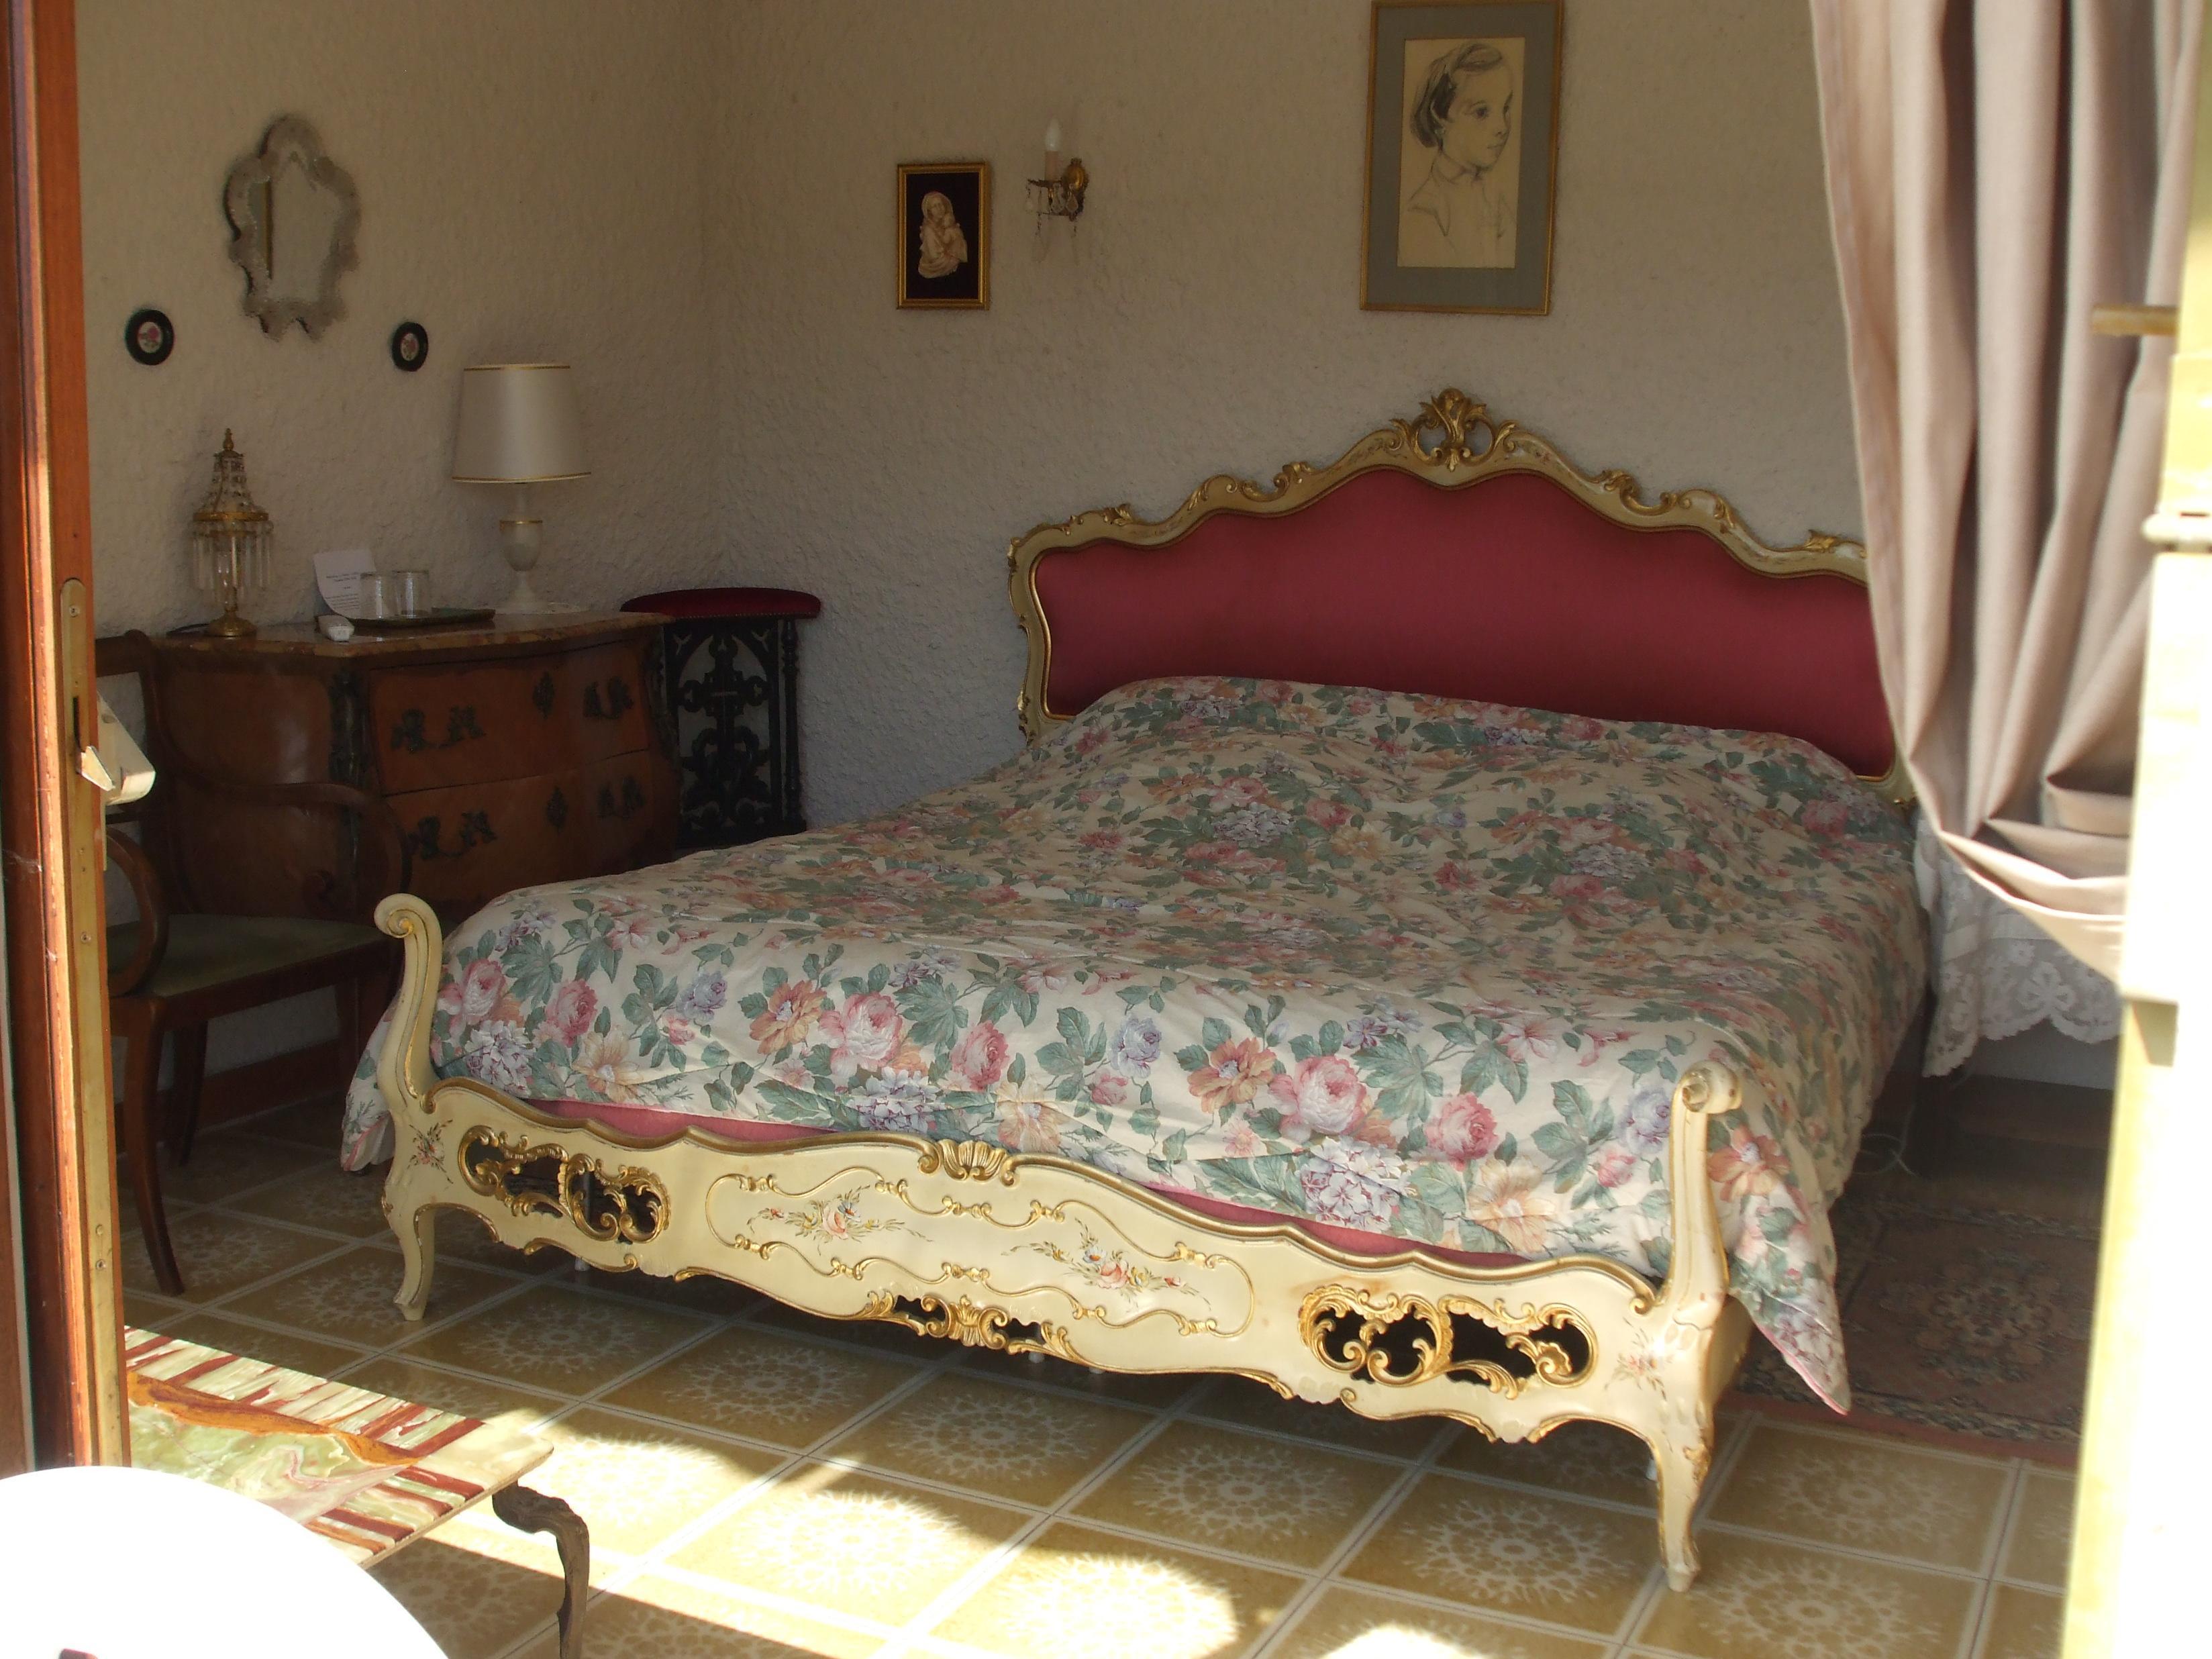 Chambre d 39 hote talloires lac d 39 annecy chambre d 39 hotes a - Chambre d hote annecy et environs ...